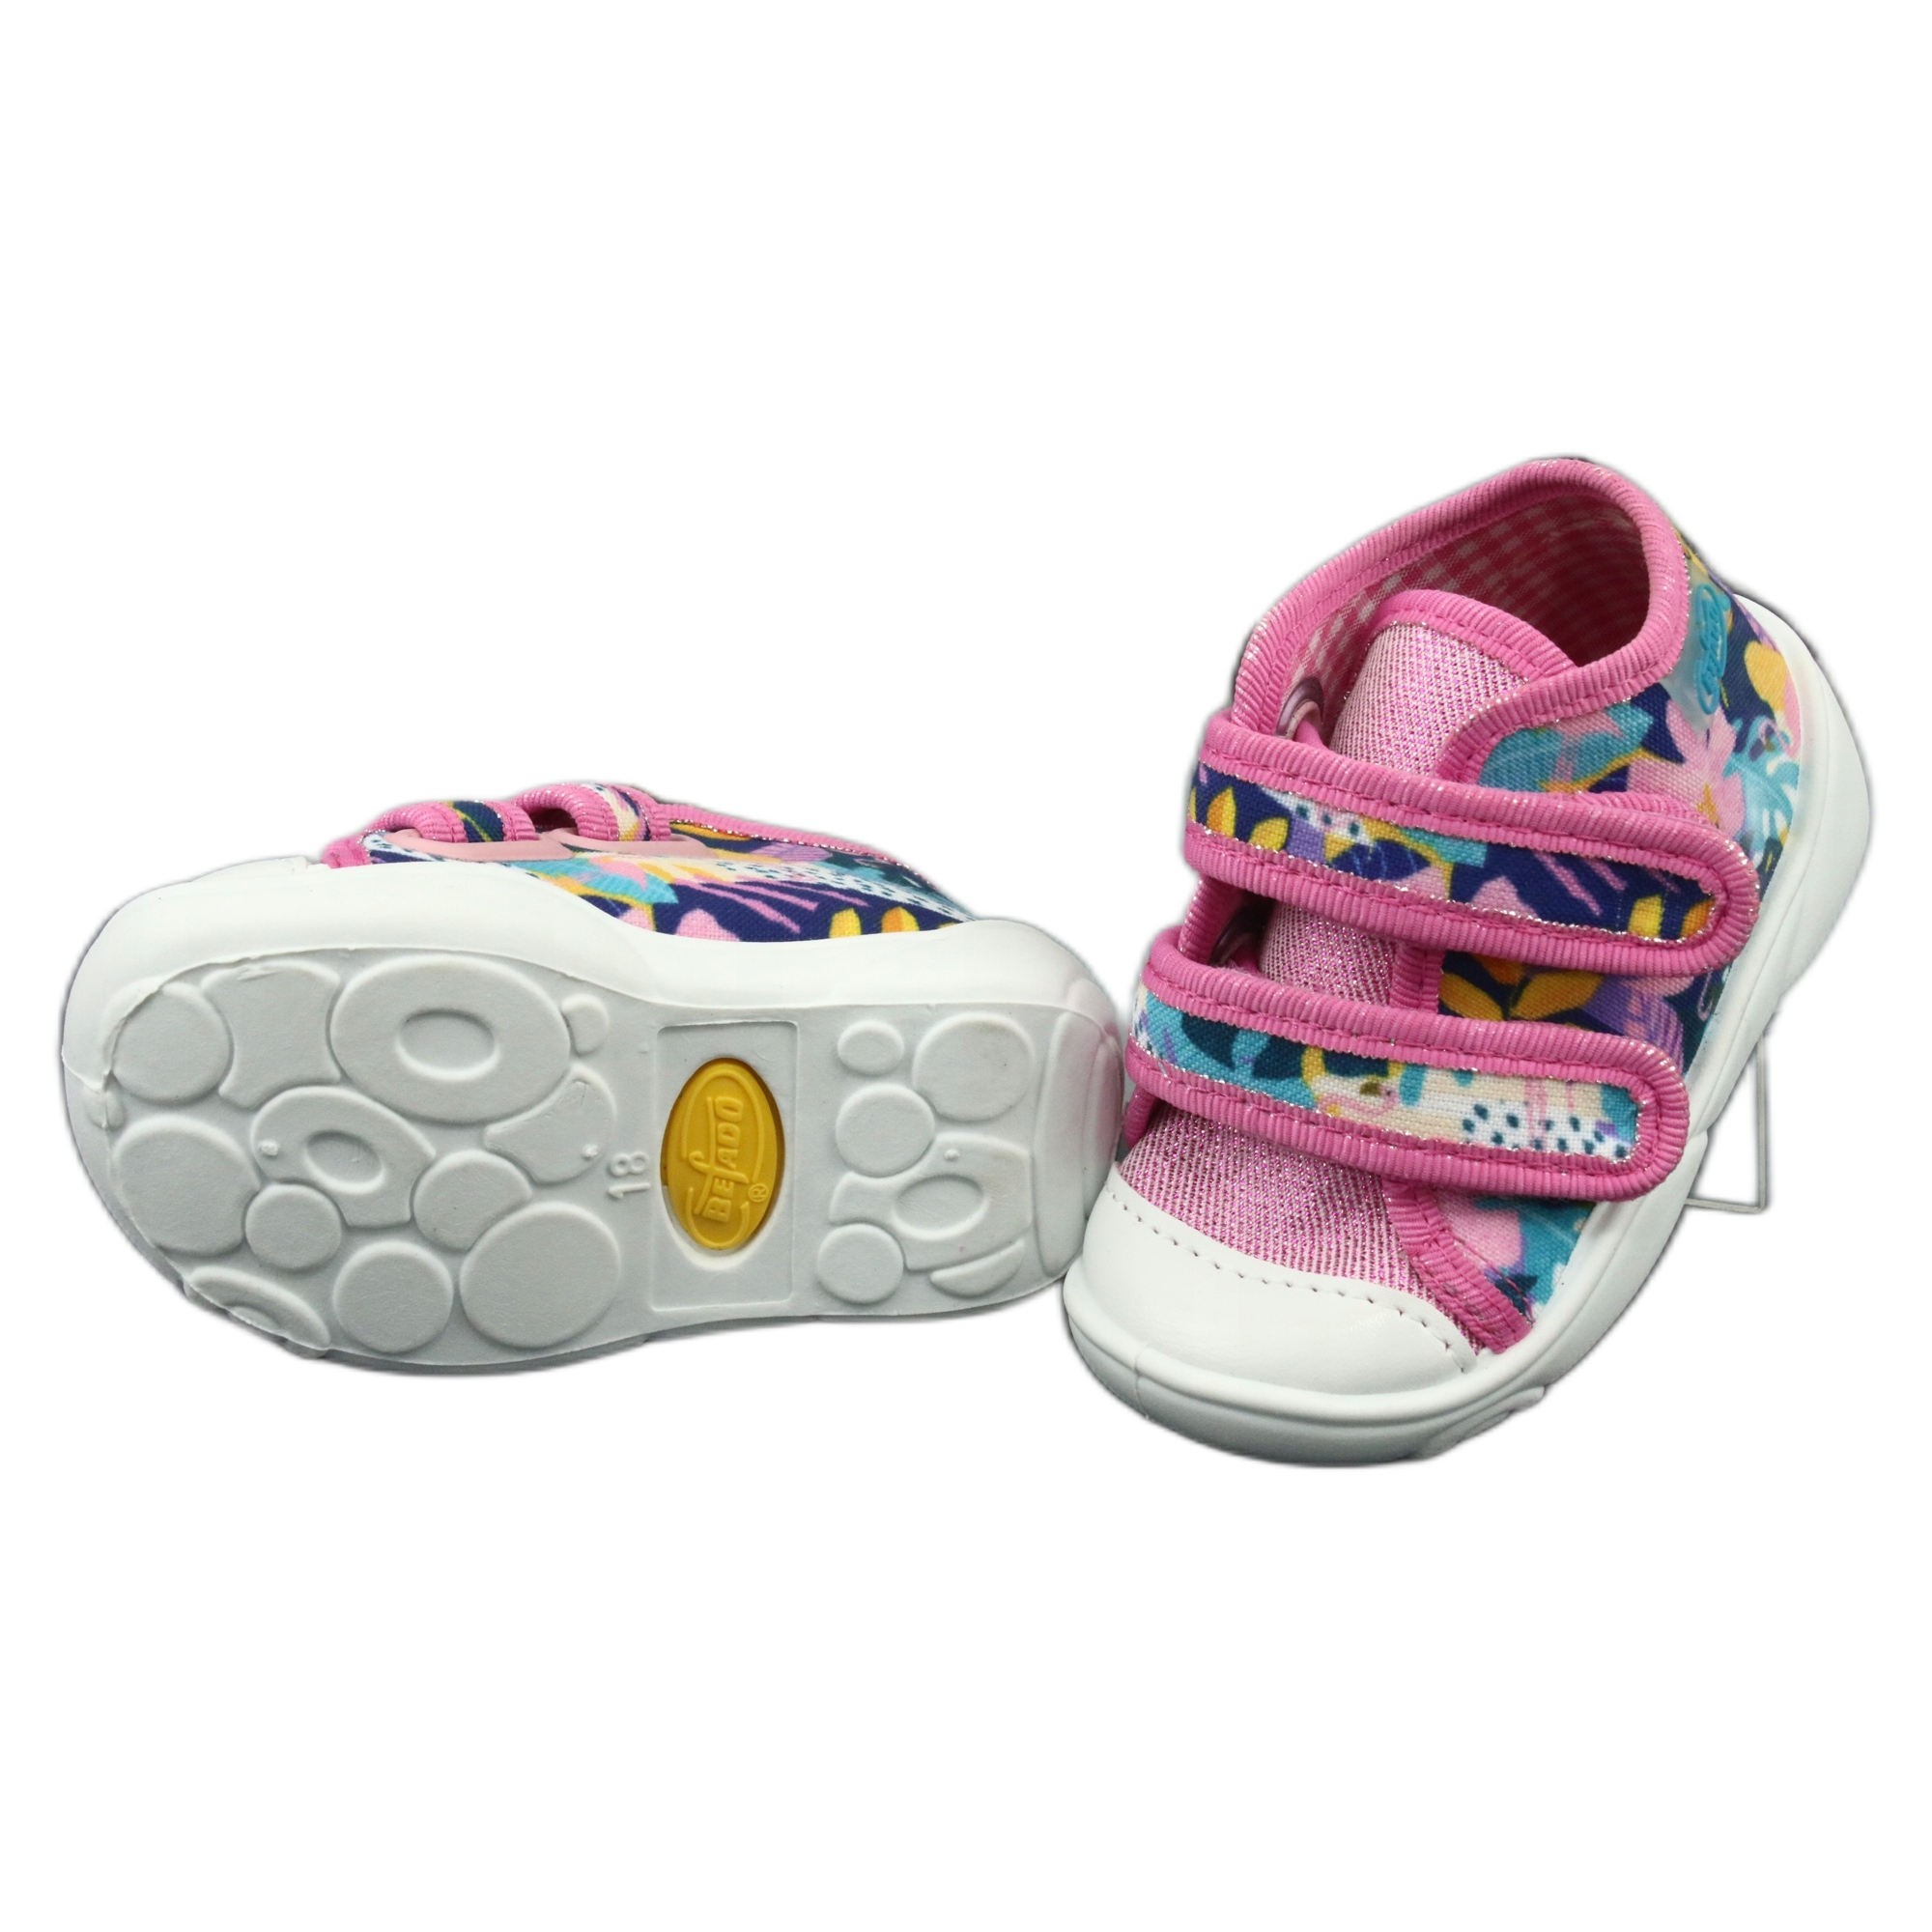 miniatura 4 - Scarpe per bambini Befado arancione 212P064 bianco marina blu rosa giallo